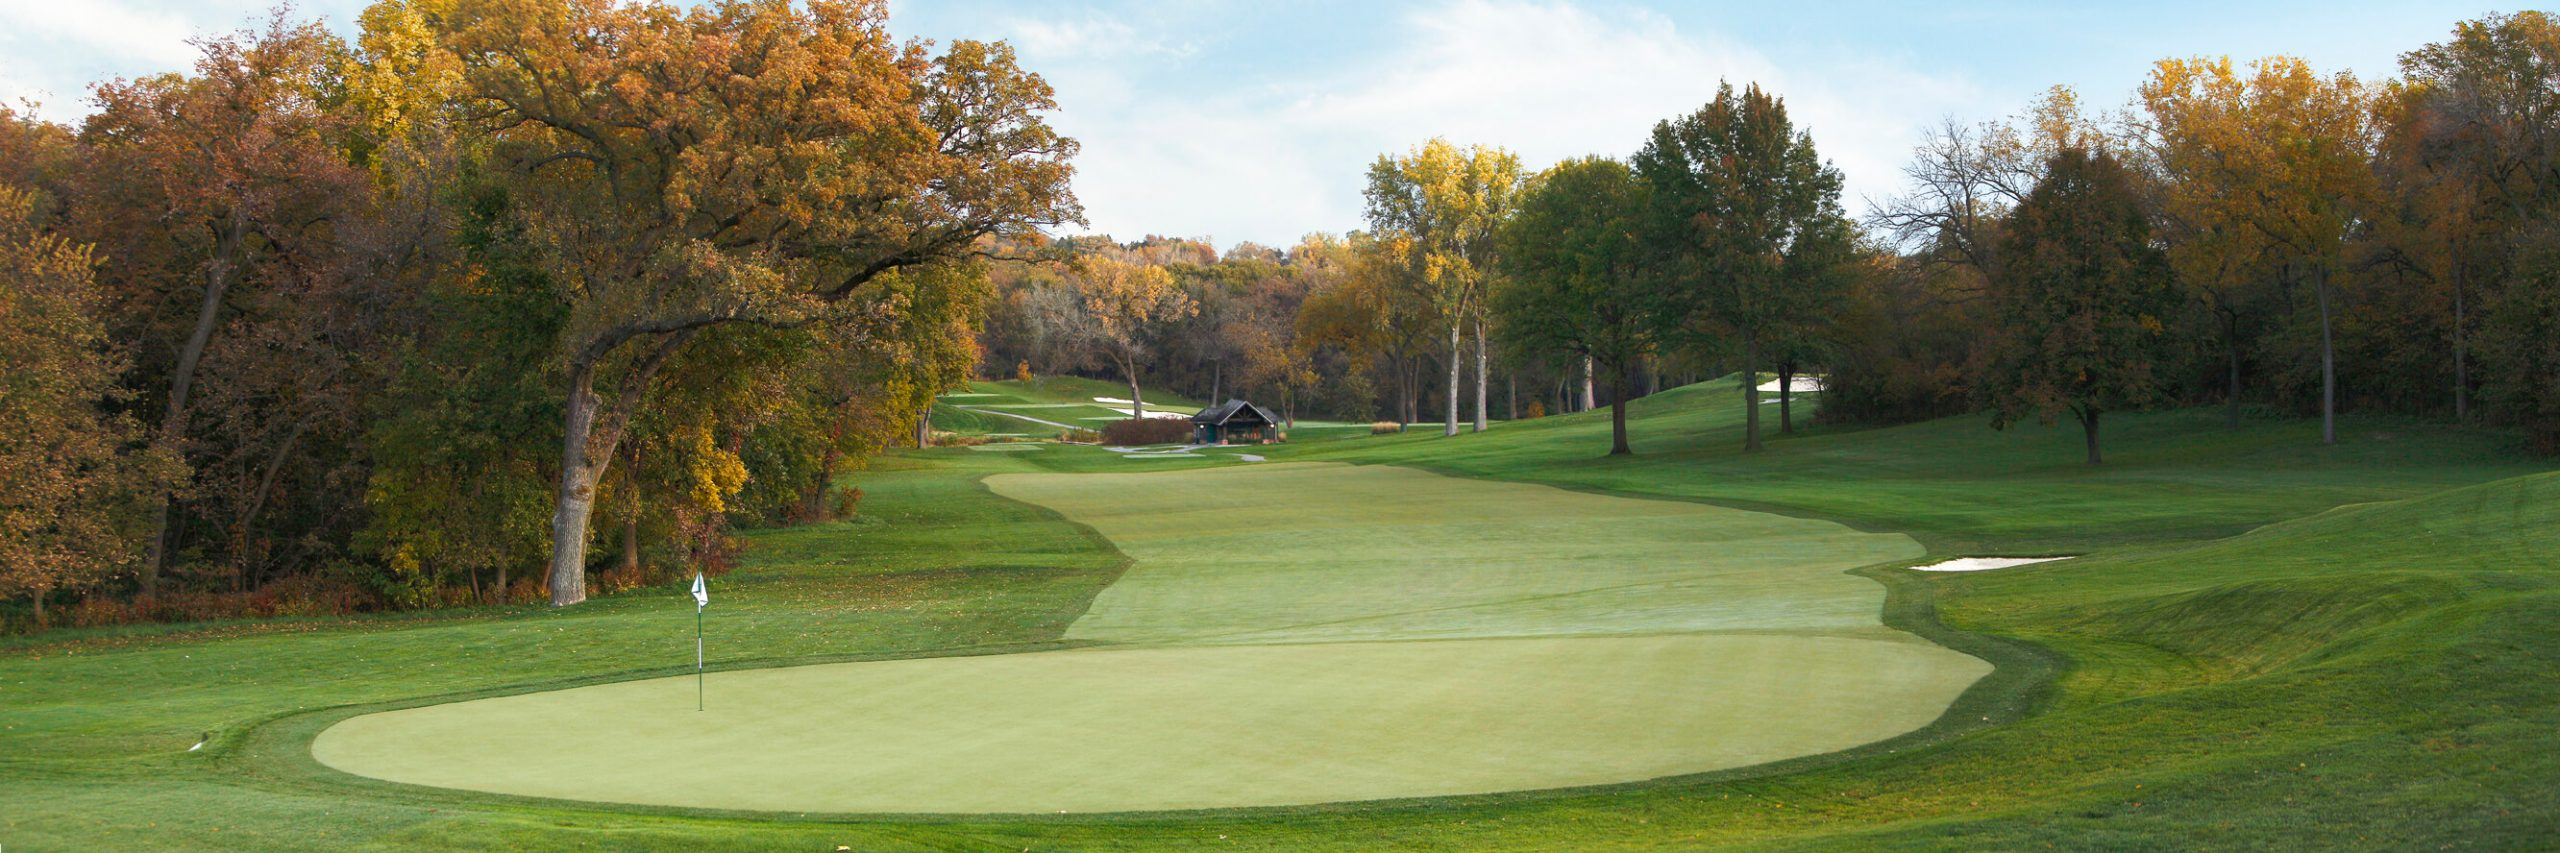 Golf Course Image - Omaha Country Club No. 8